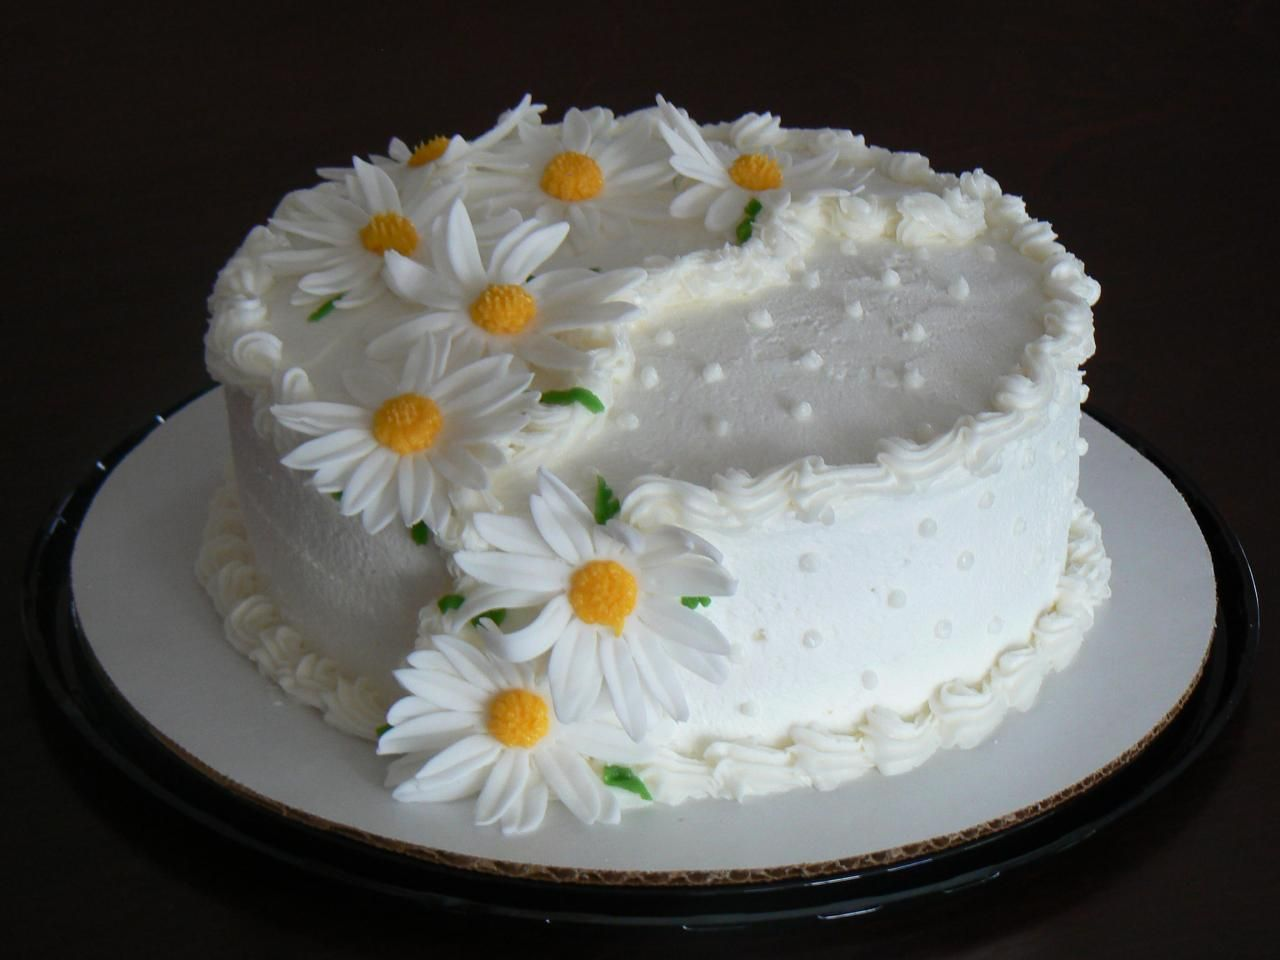 Birthday Cakes Beautiful Pictures ~ Beautiful birthday cakes with flowers end beautiful delicious cake